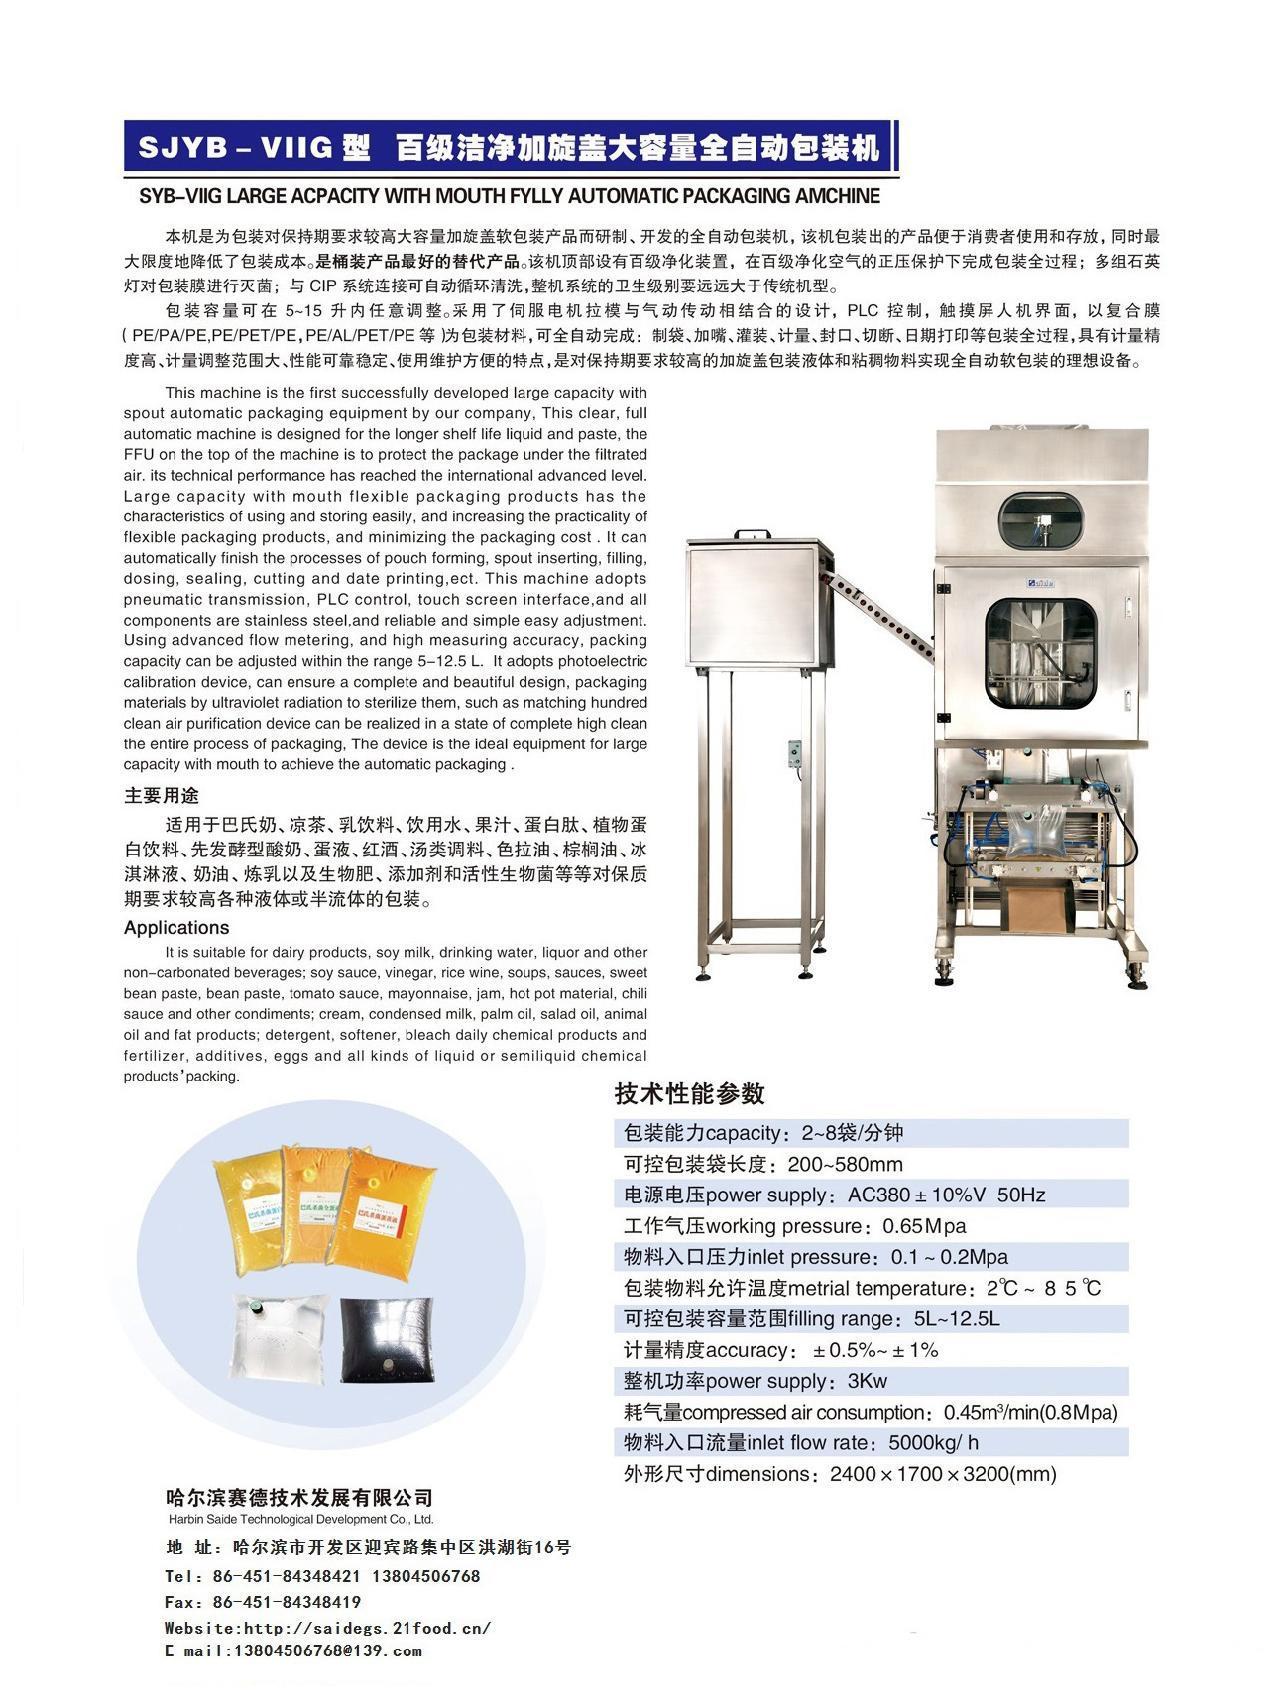 SJYB-VIIG型百级洁净加盖大容量蛋液包装机